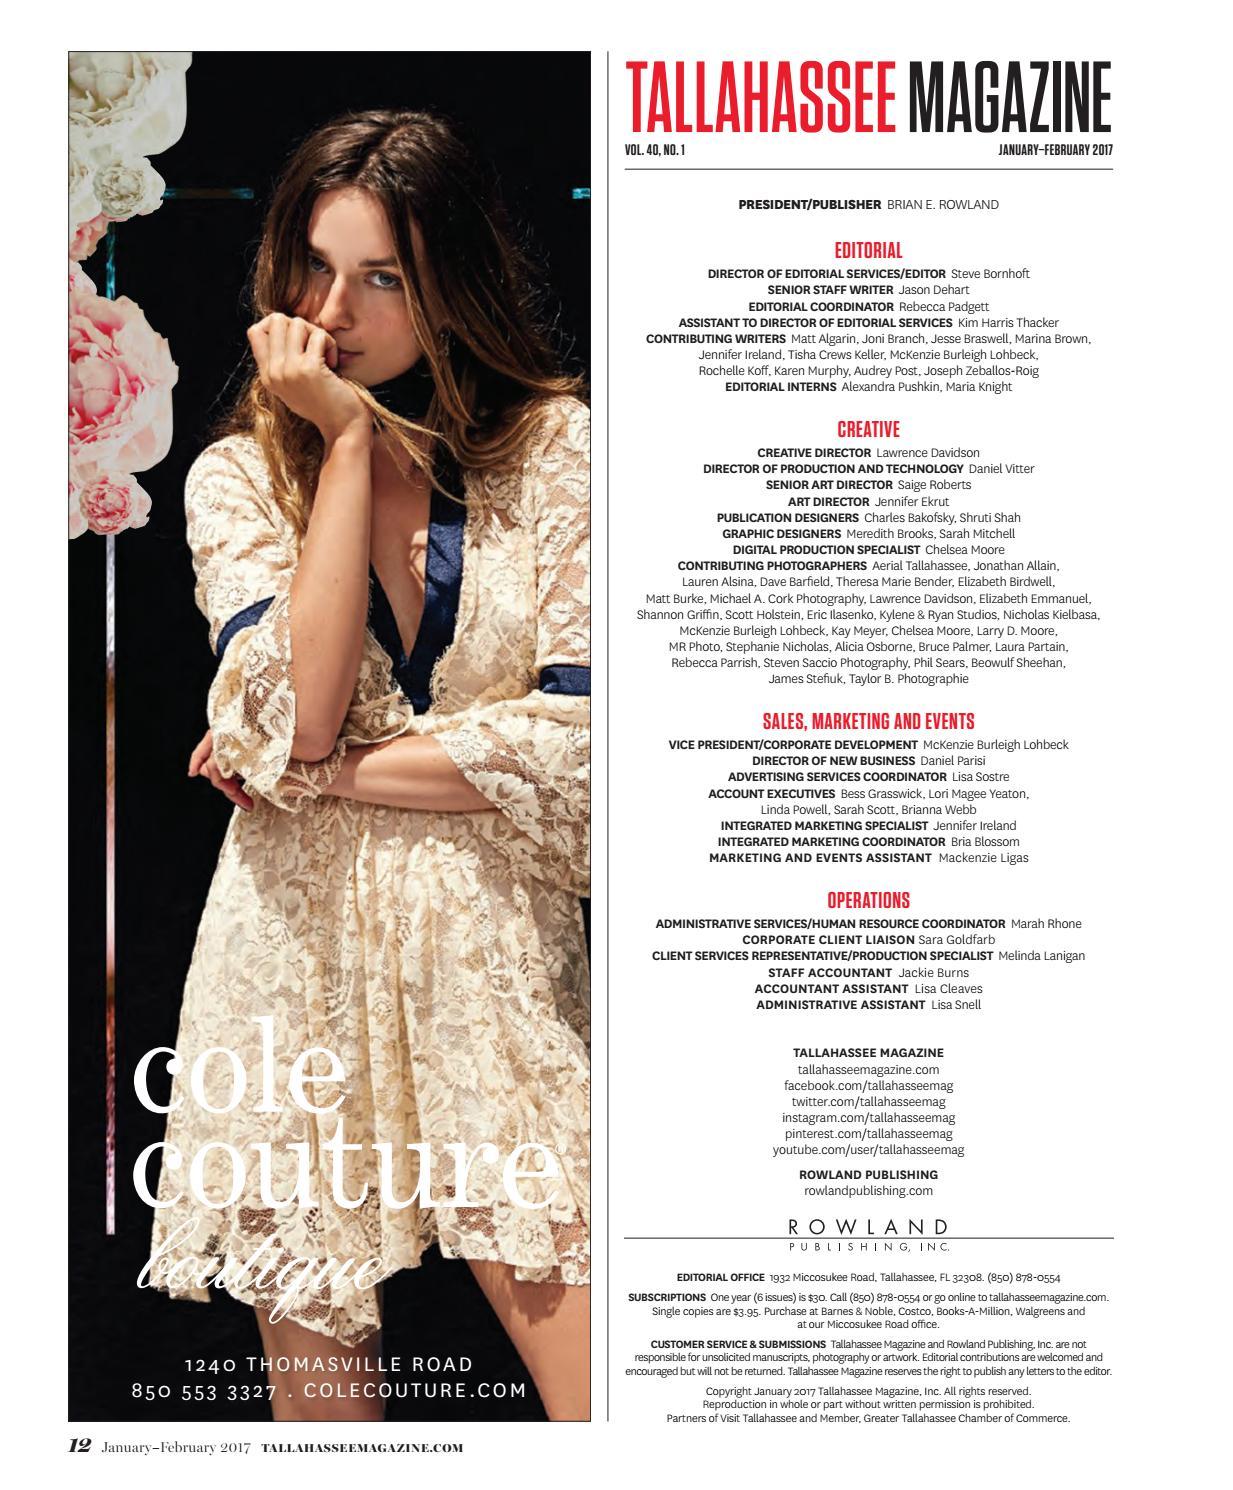 Tallahassee Magazine- January/February 2017 by Rowland